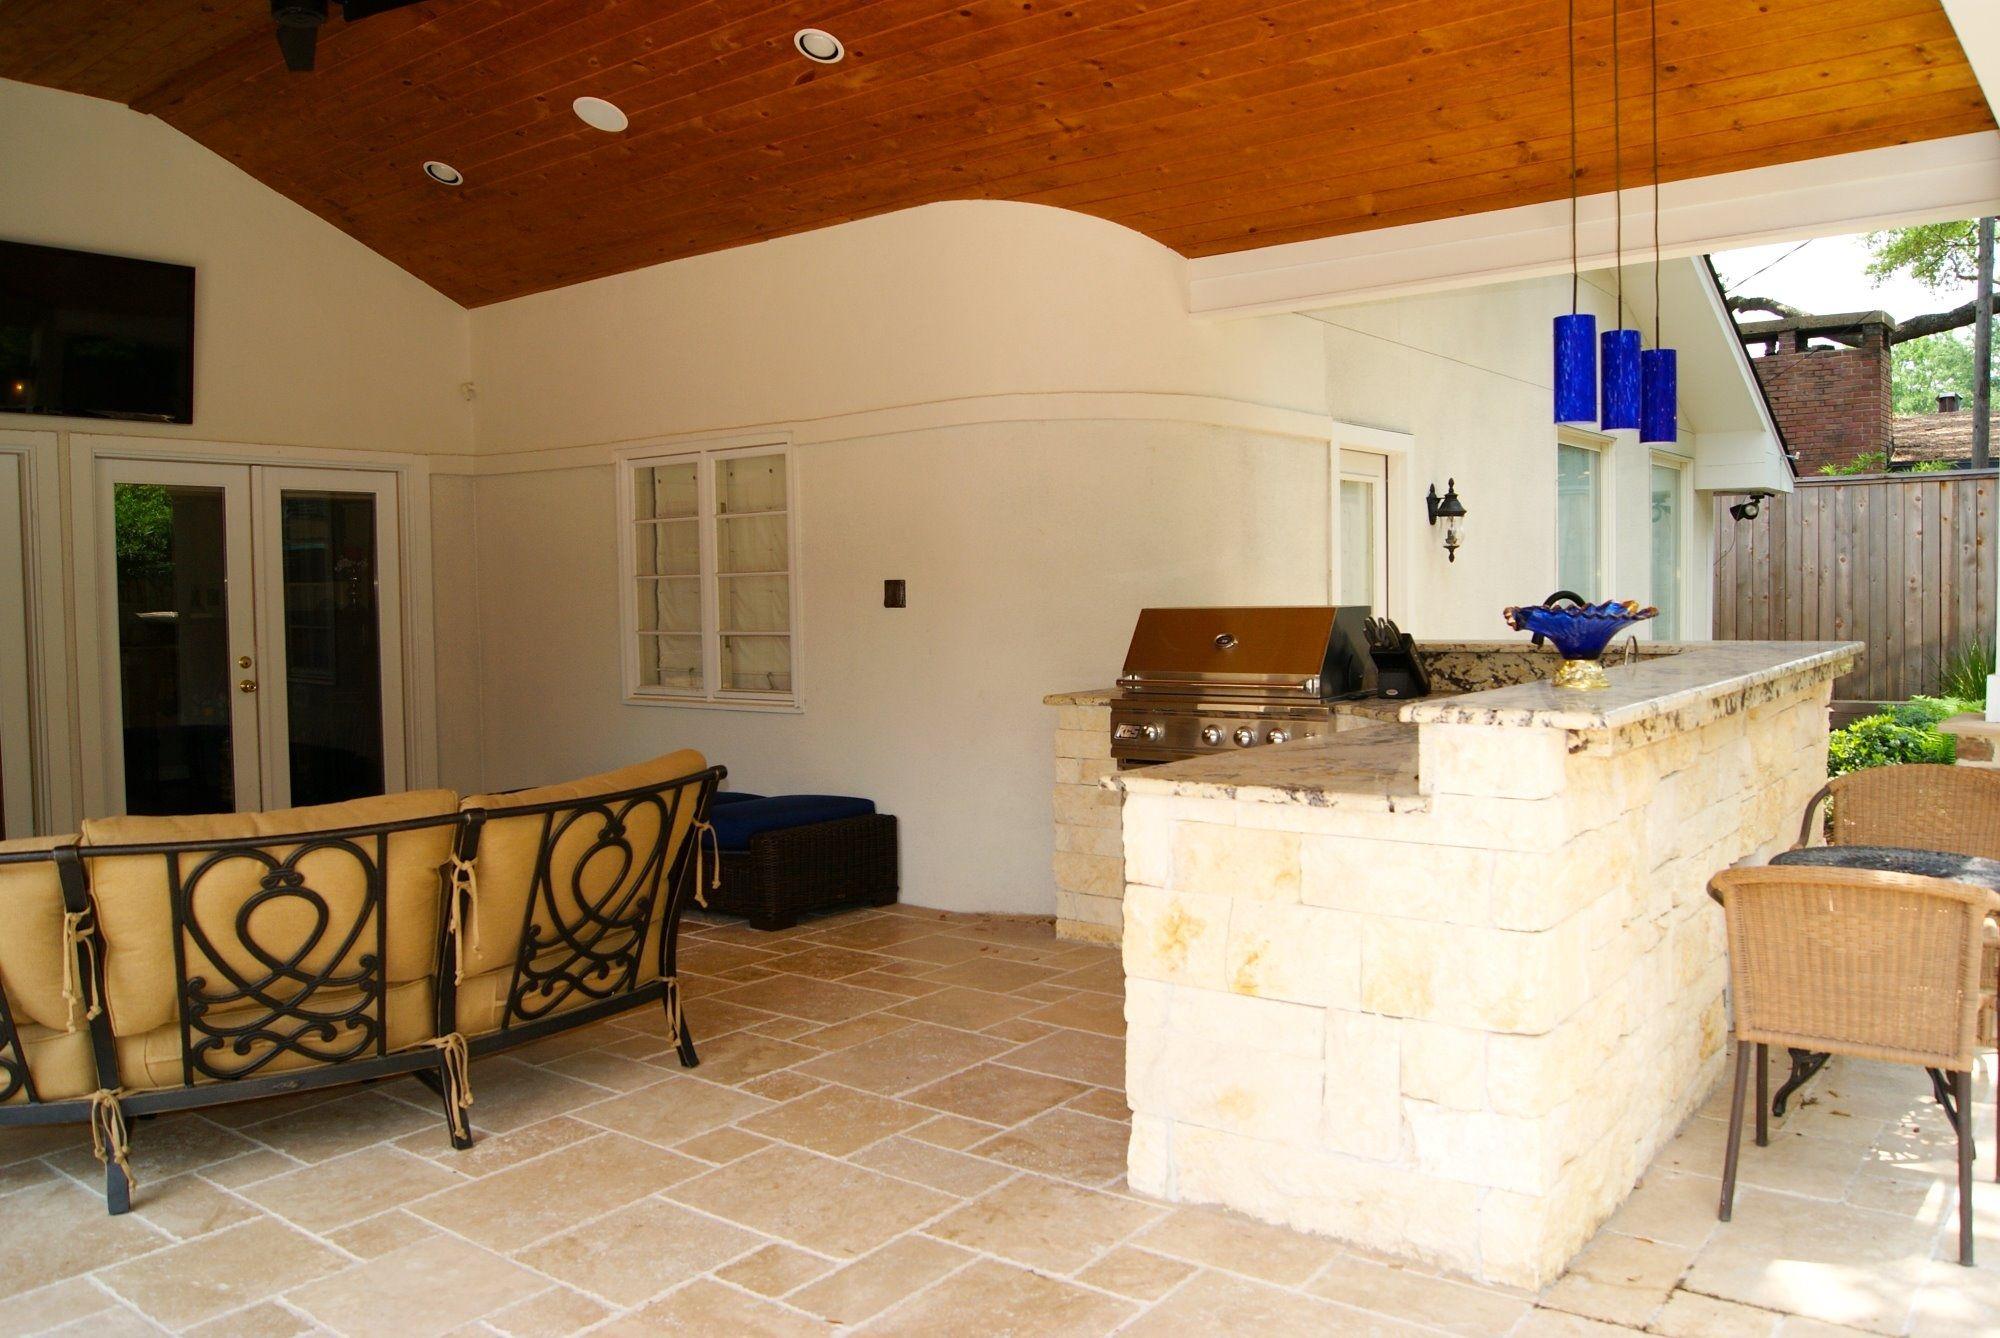 Outdoor Kitchen And Travertine Tile Flooring Patio Flooring Patio Design Travertine Floor Tile